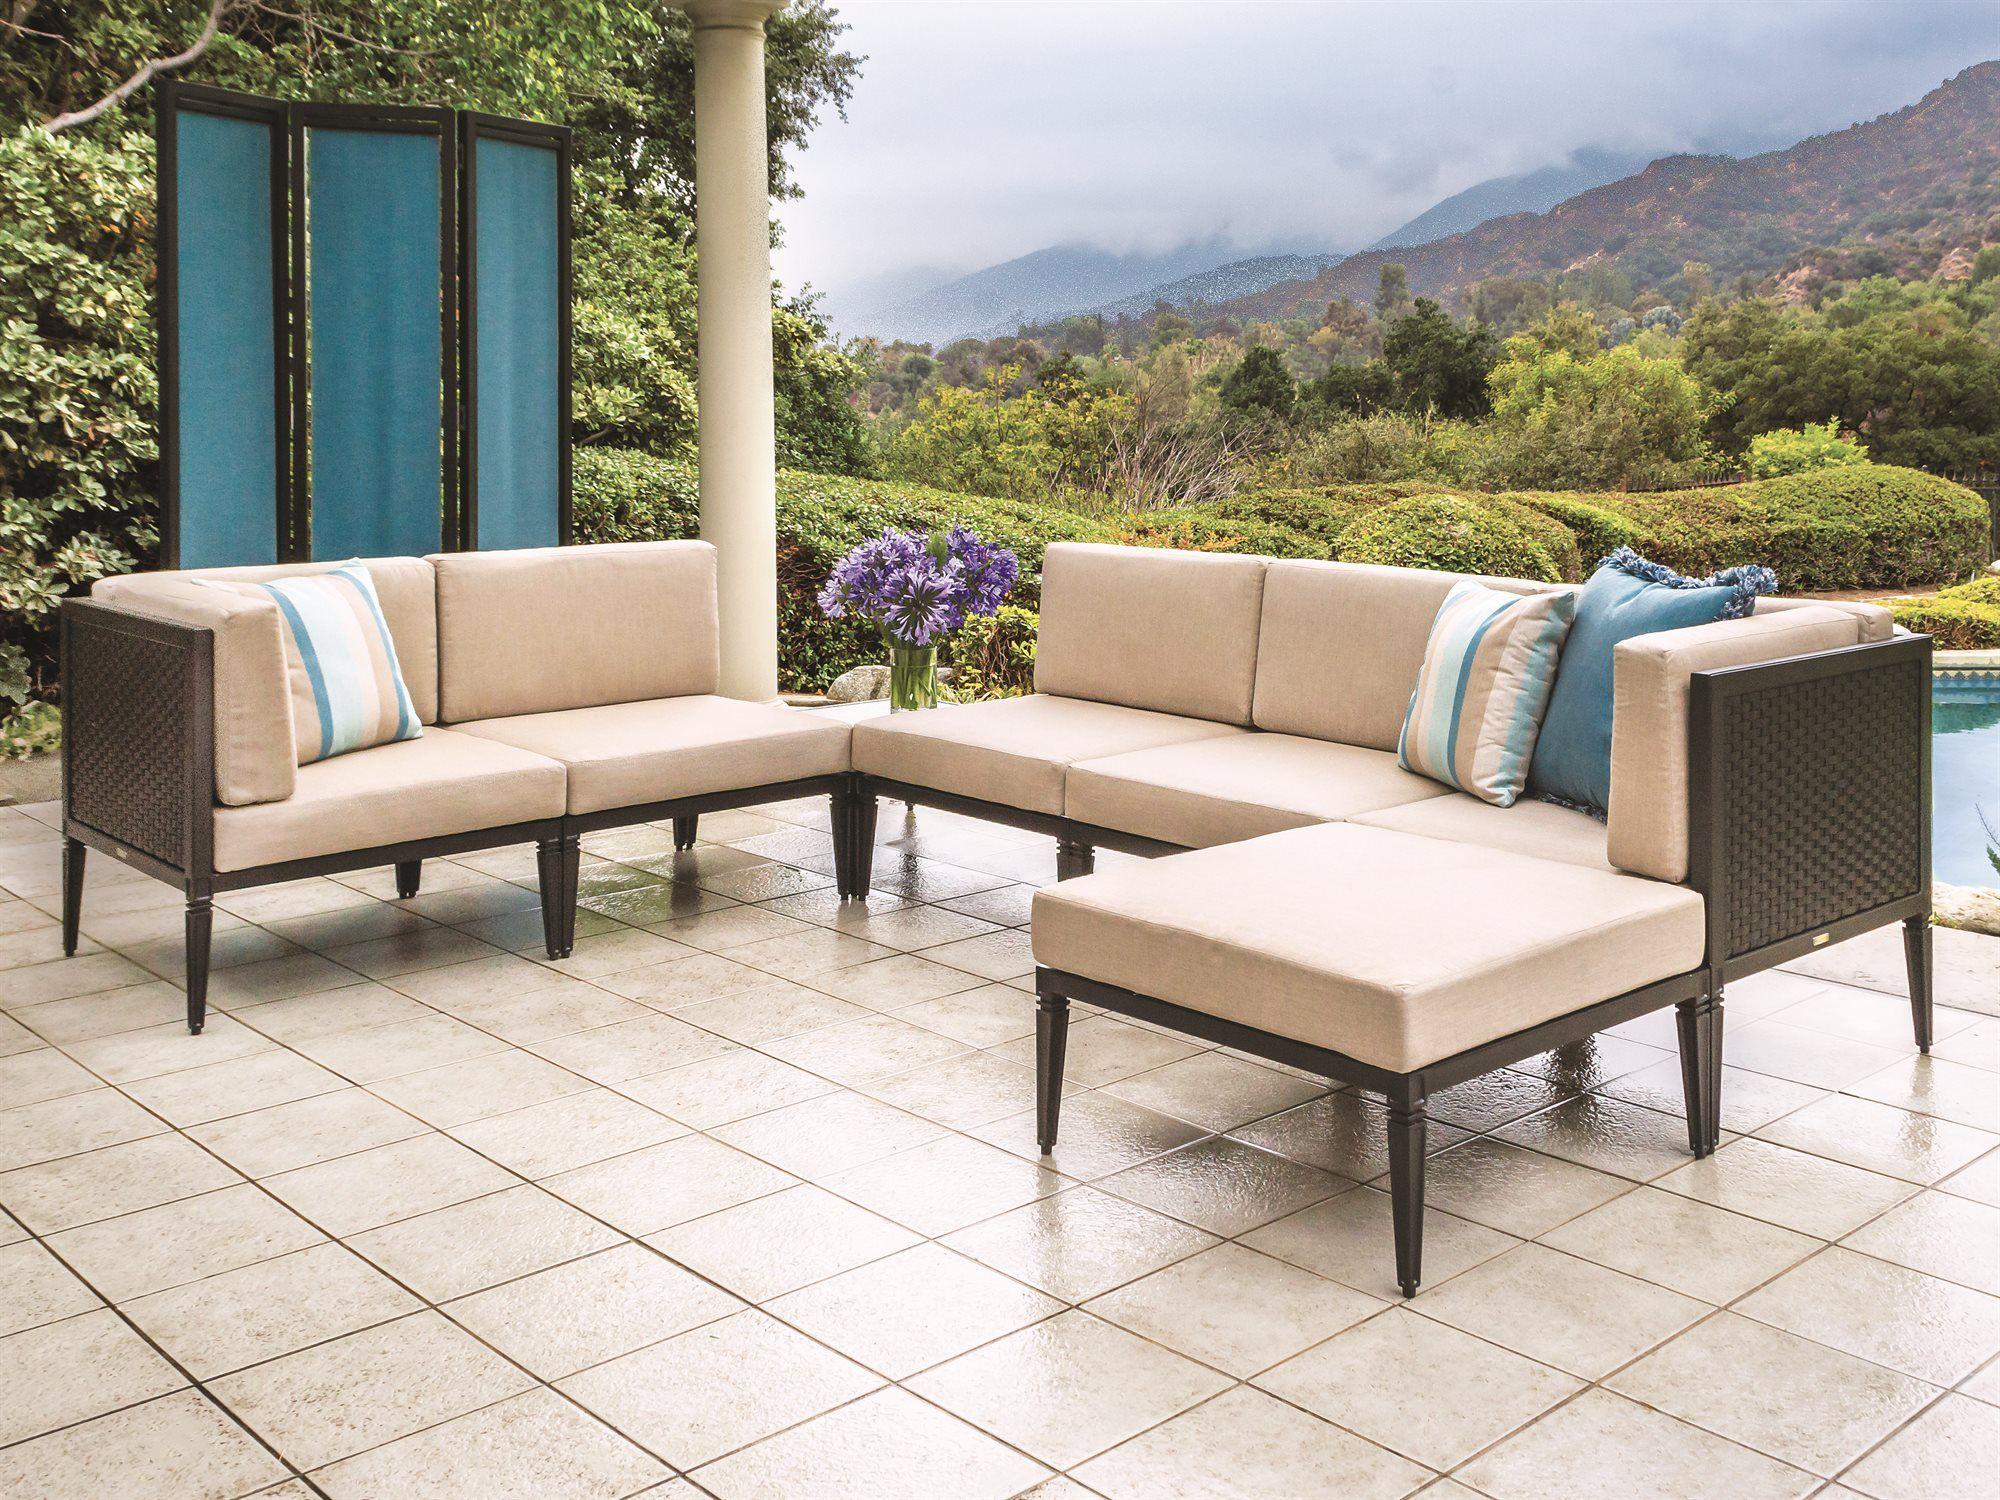 Gensun Drake Woven Modular Cushion Lounge Set Outdoor Living